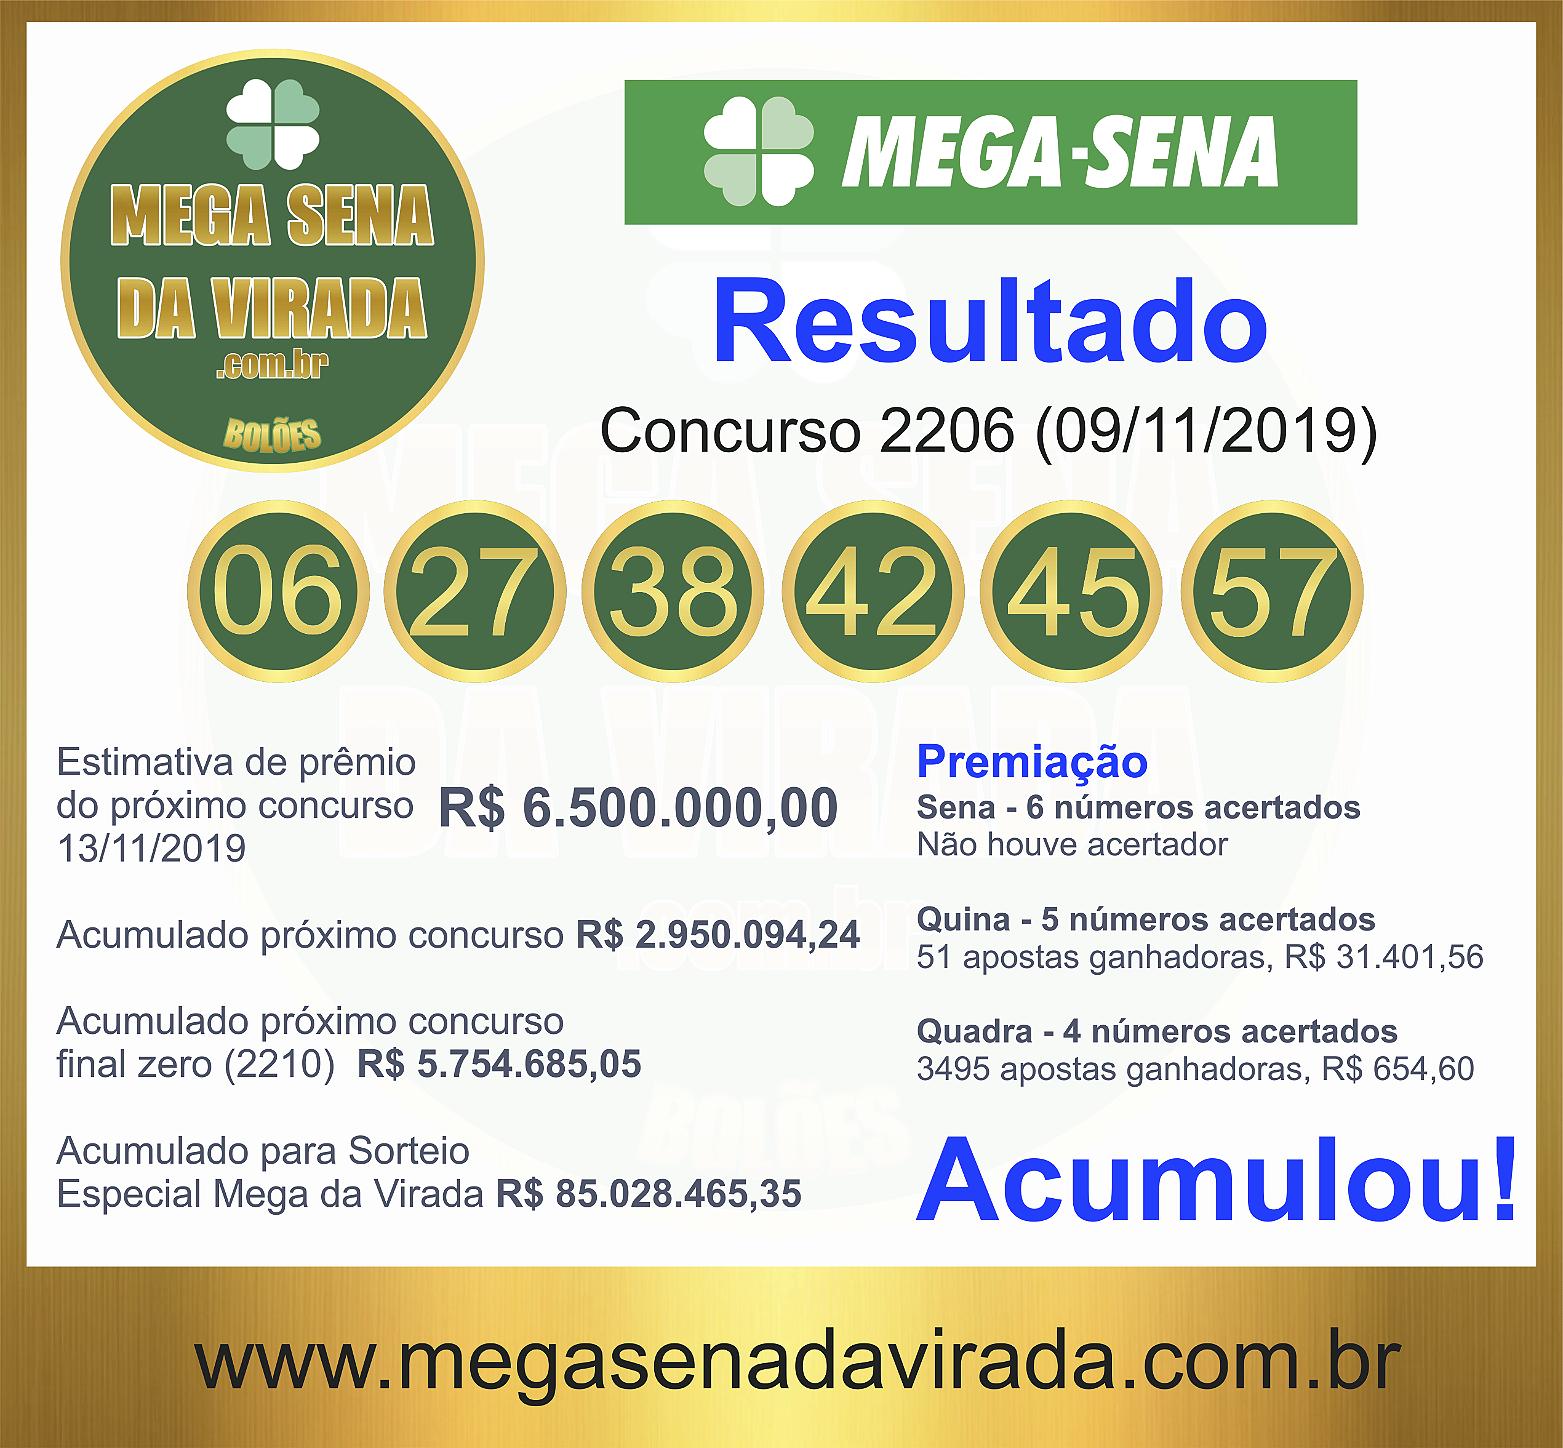 Mega Sena Concurso 2206 09/11/2019